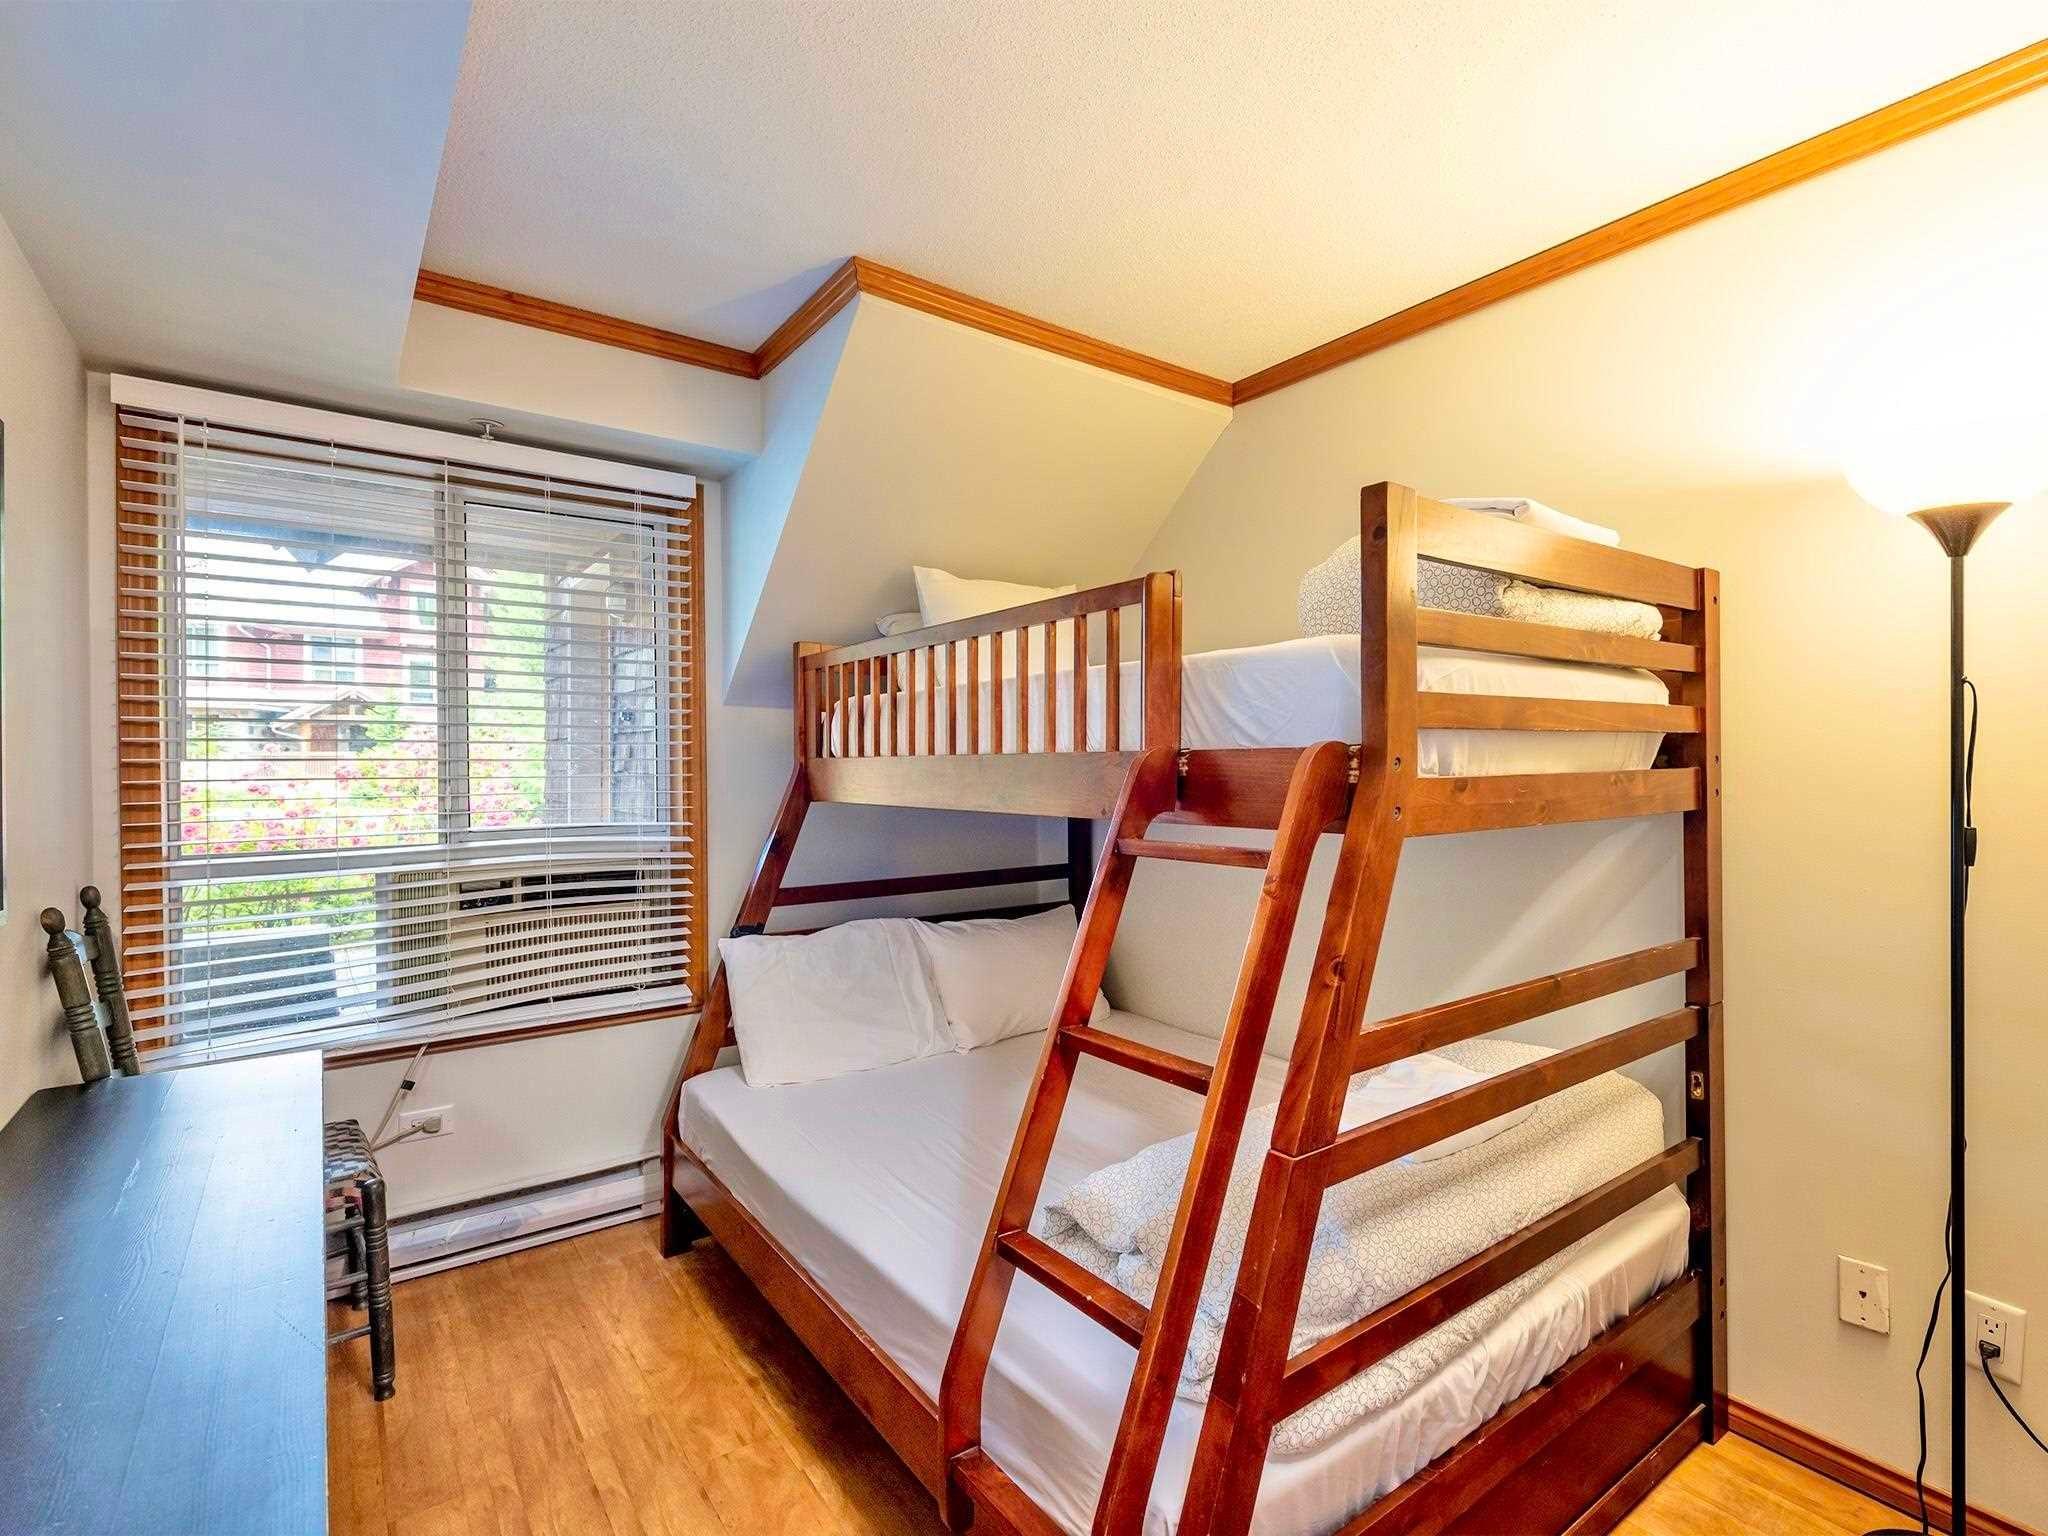 73 4388 NORTHLANDS BOULEVARD - Whistler Village Townhouse for sale, 2 Bedrooms (R2580863) - #14